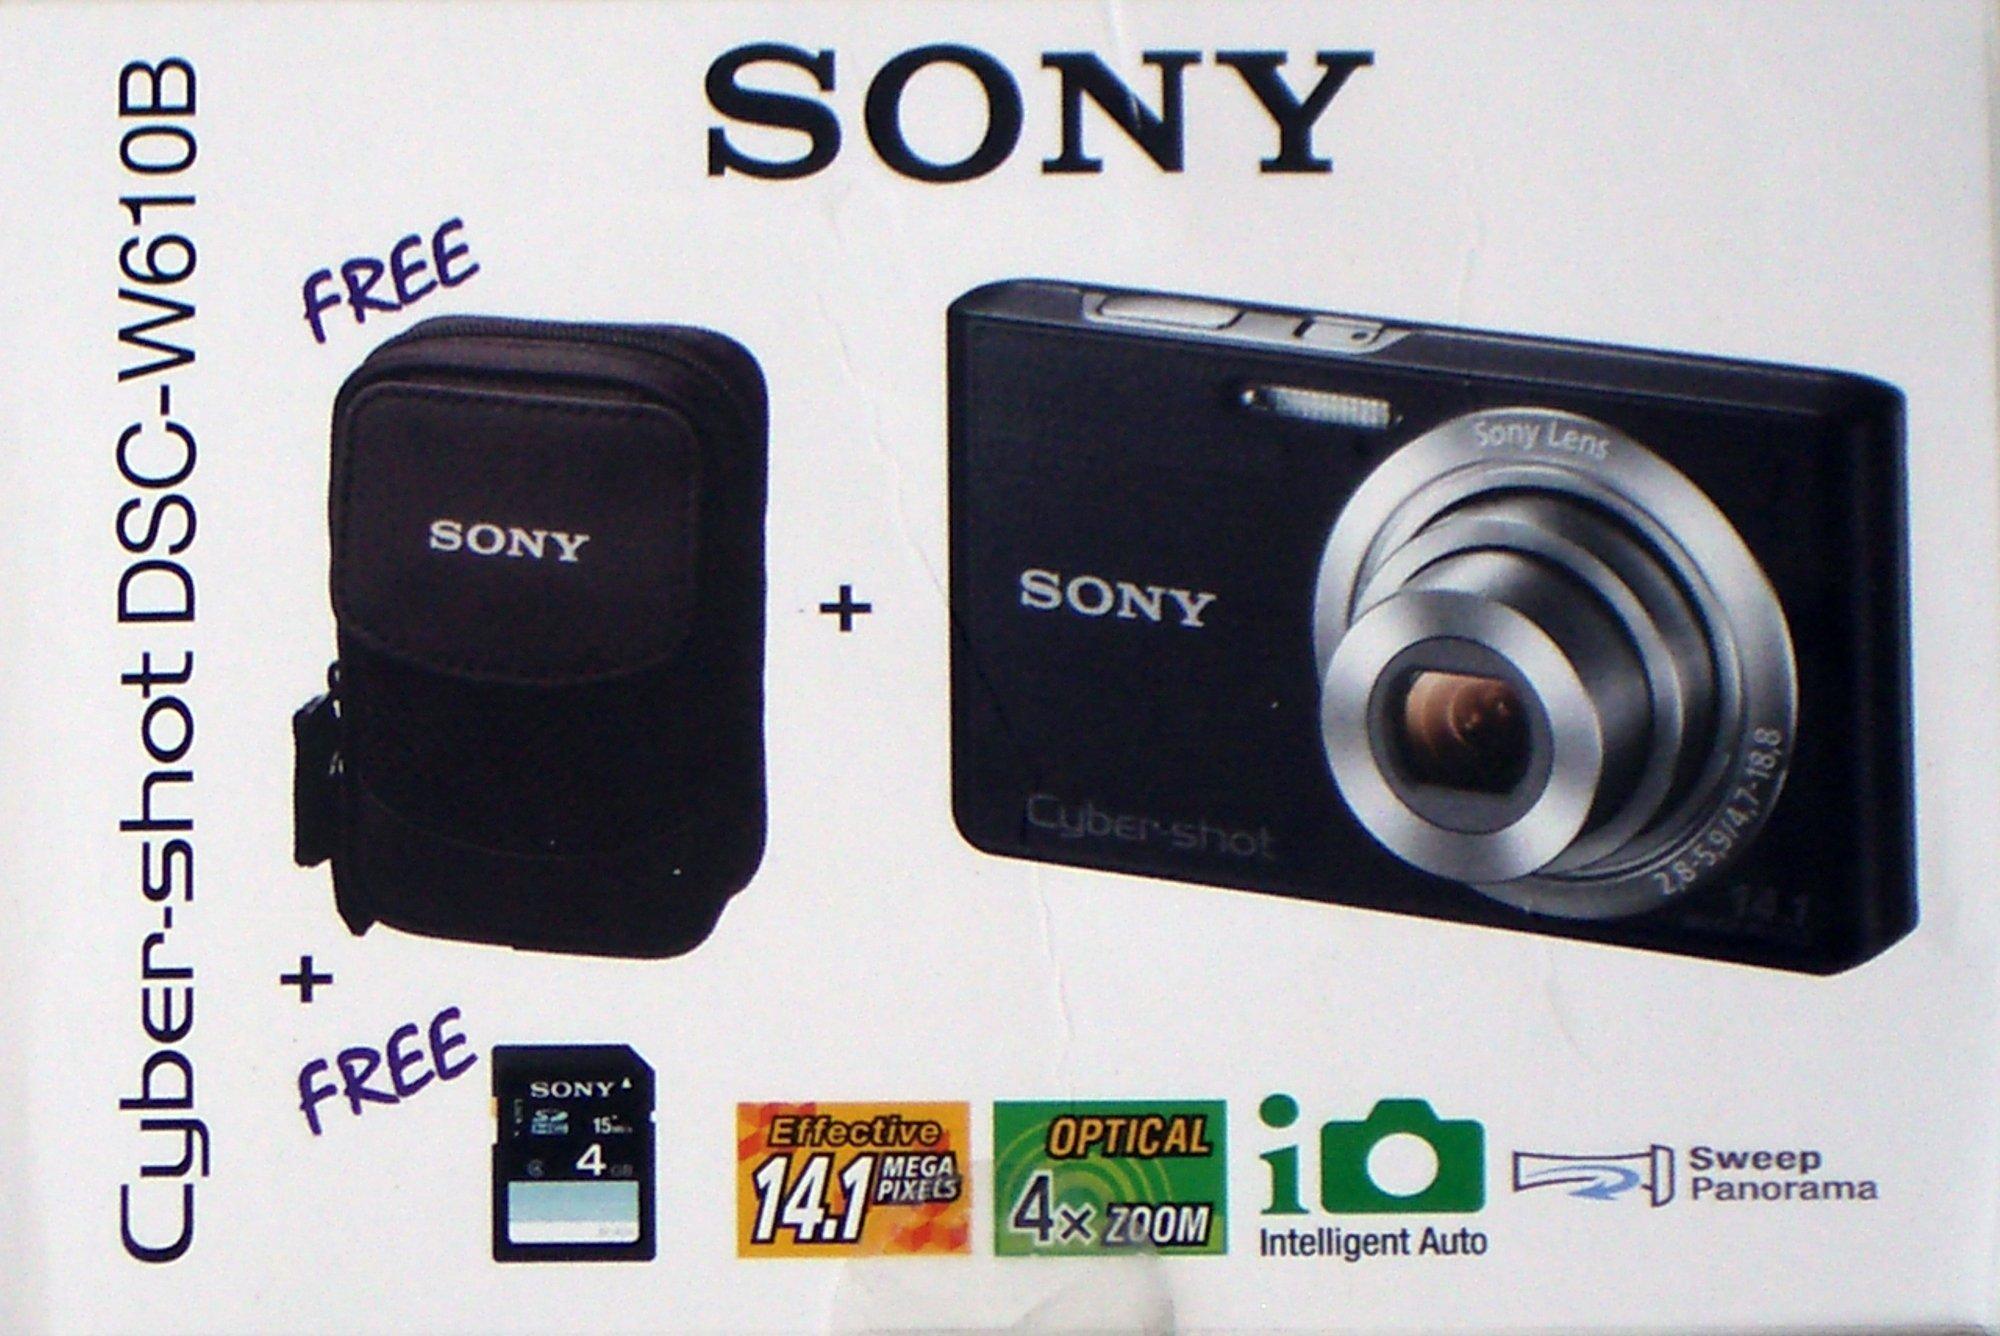 Sony Cyber Shot Dsc-W510B Camera Kit Black Includes Camera 4Gb Sd Card And Case